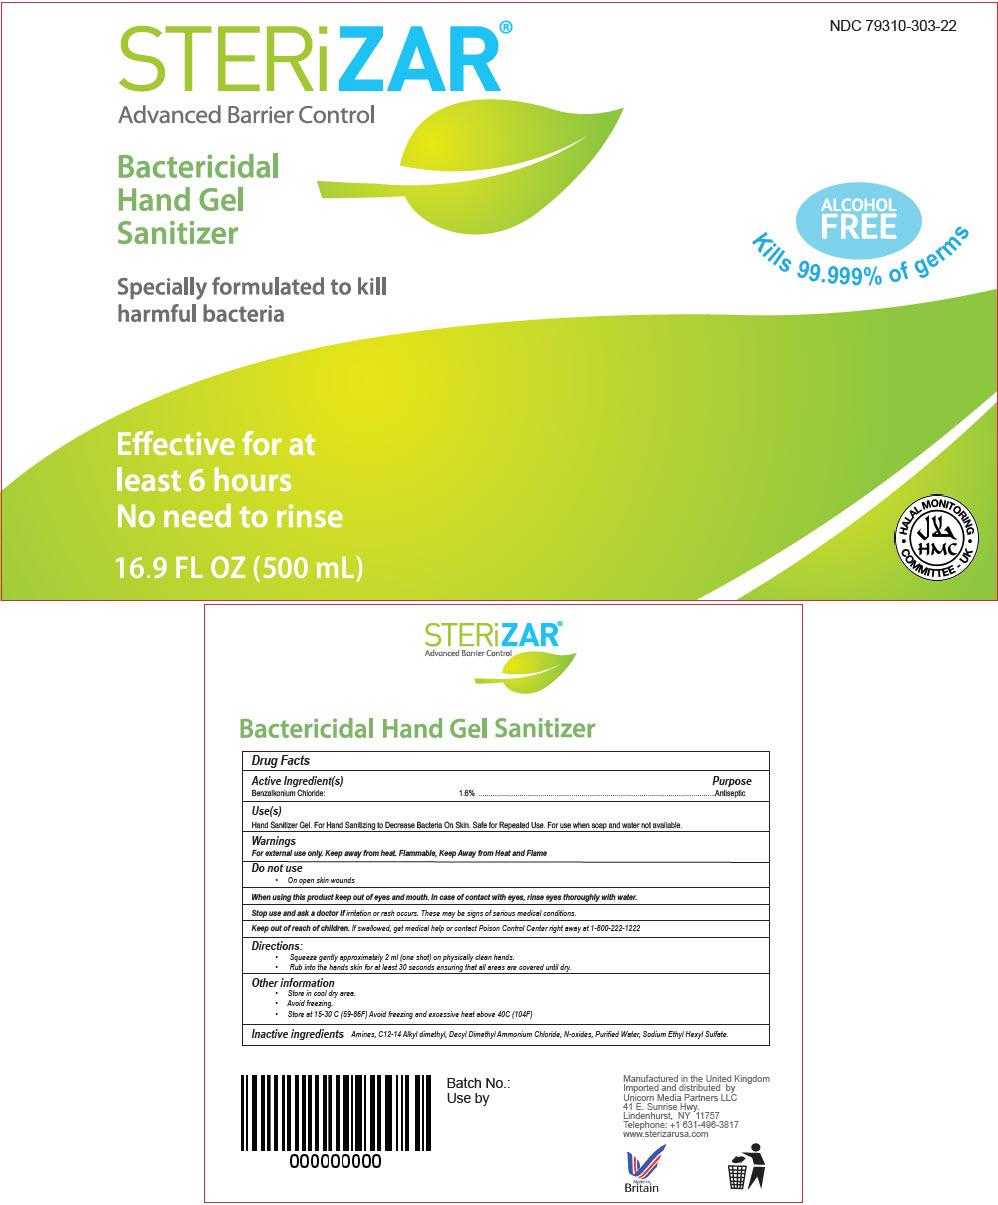 PRINCIPAL DISPLAY PANEL - 500 mL Bottle Label